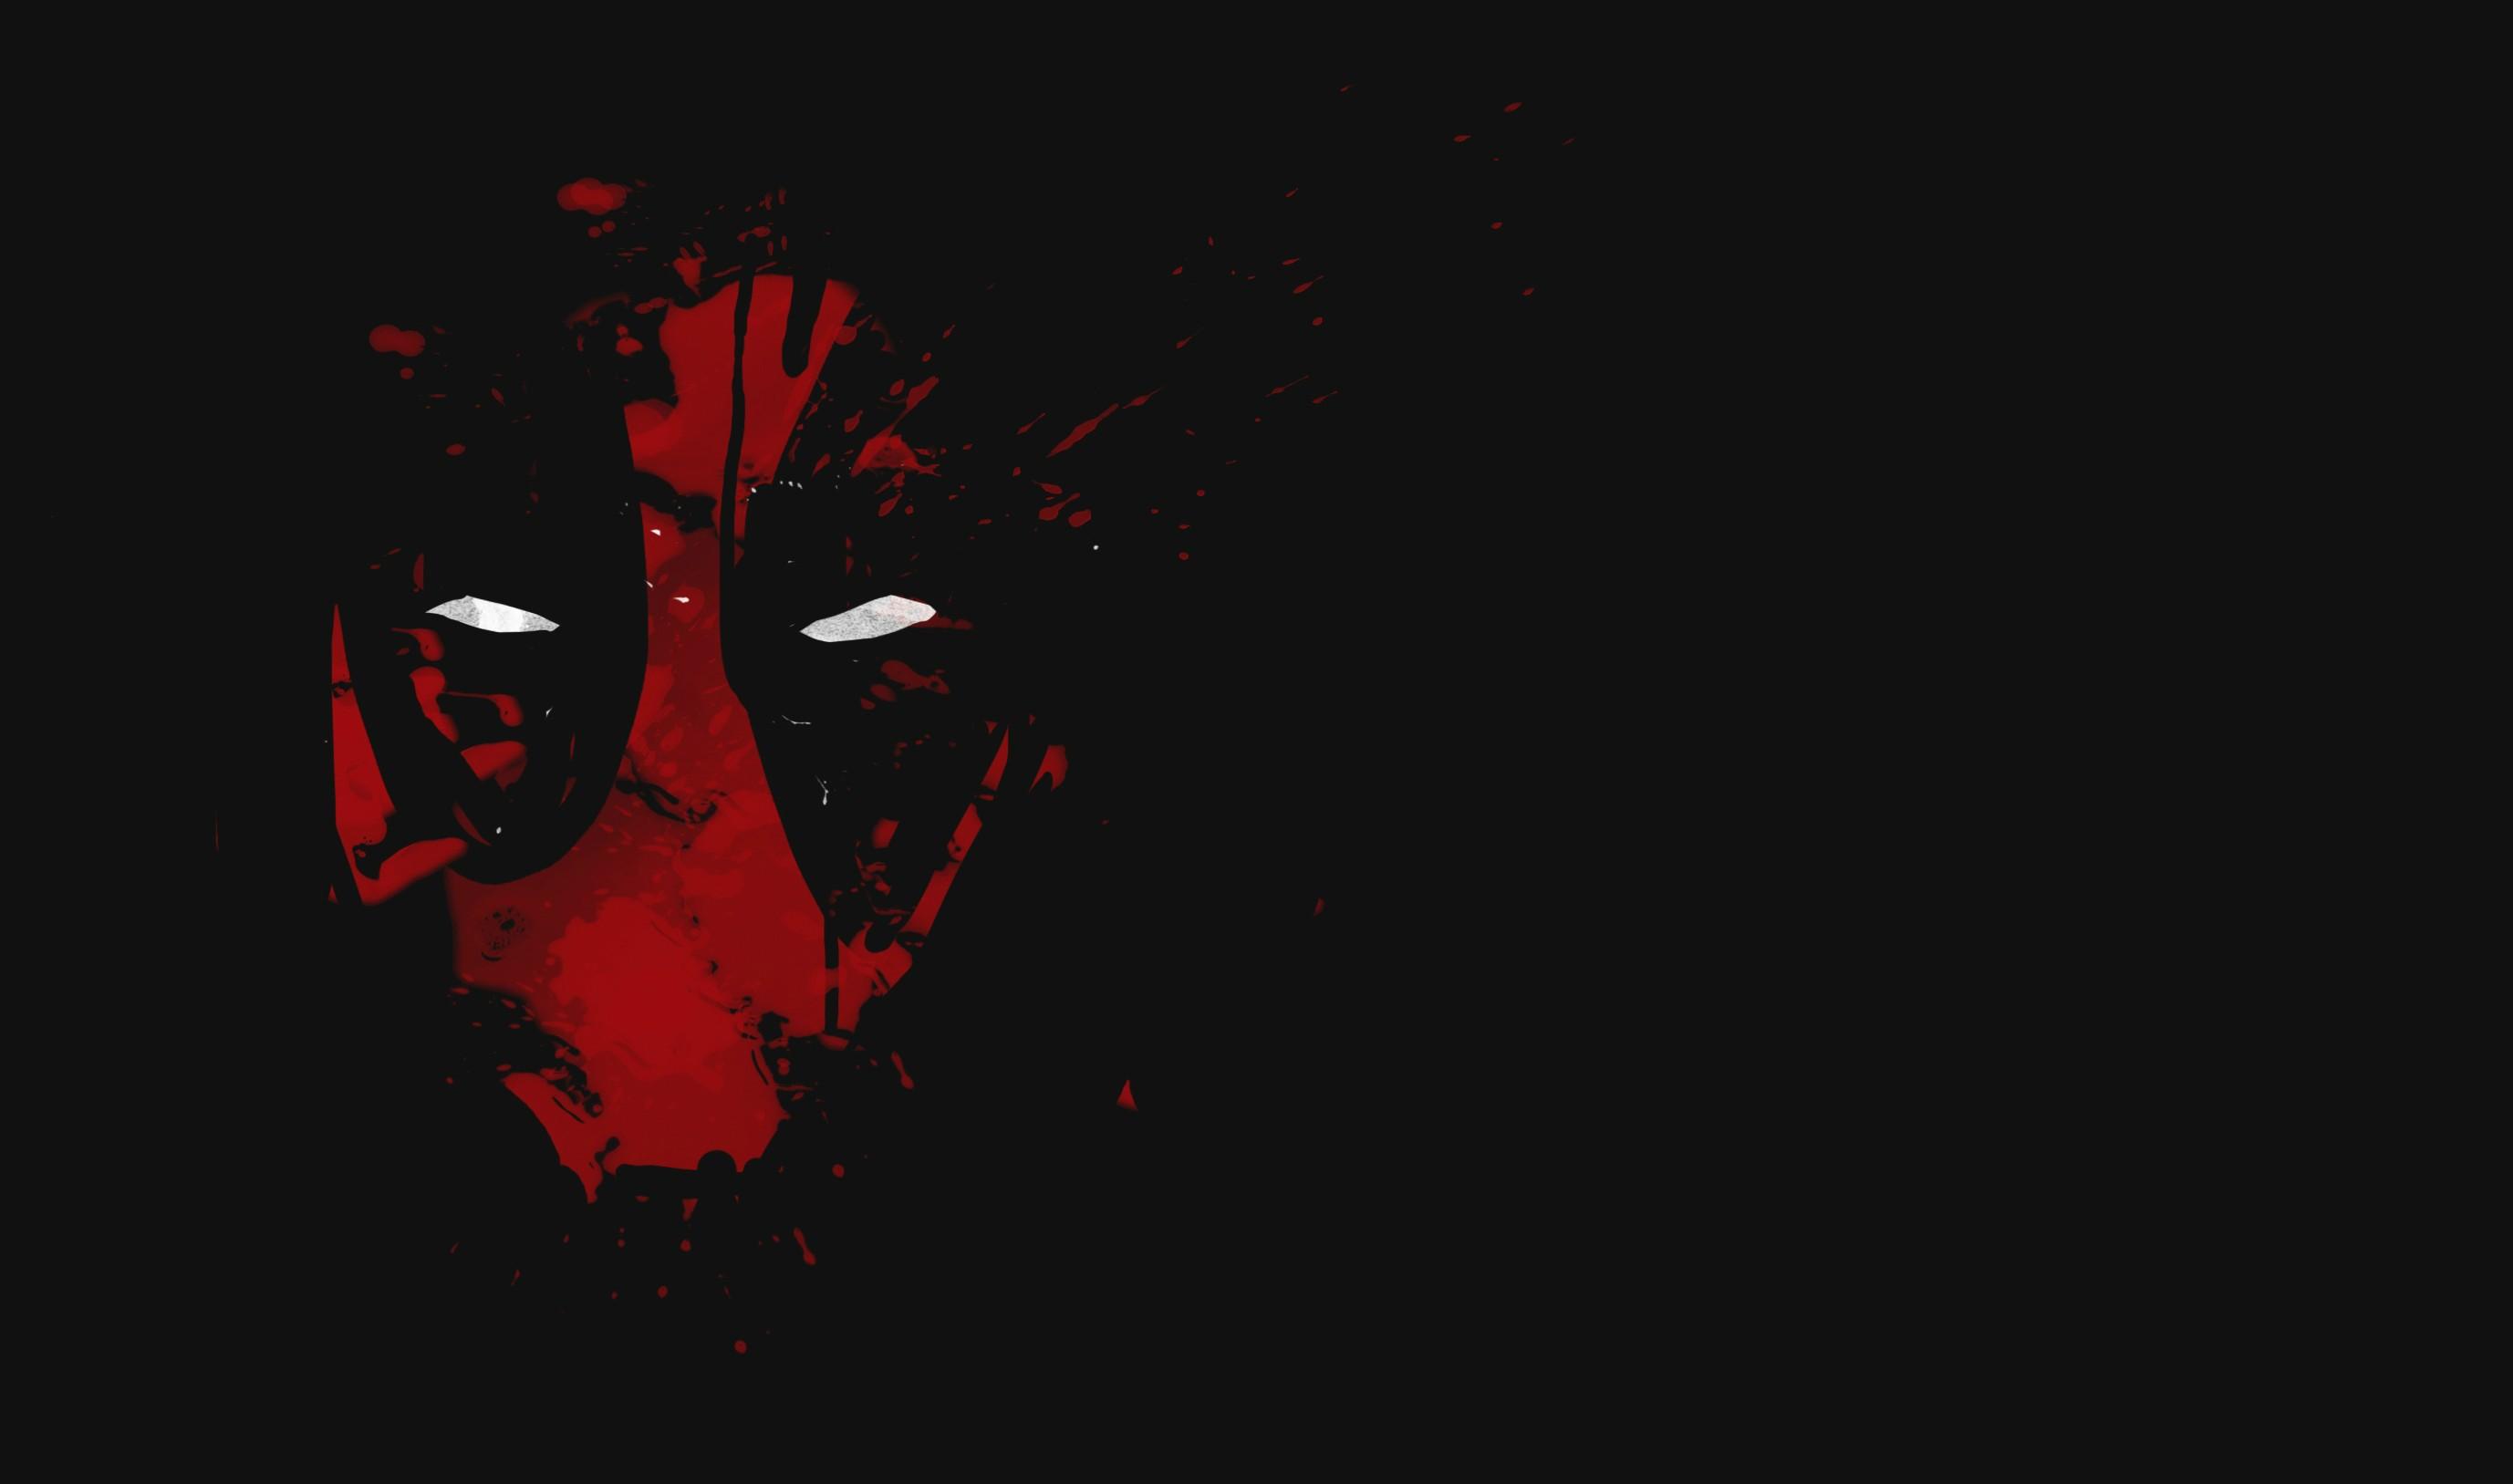 Deadpool Wallpapers s Backgrounds